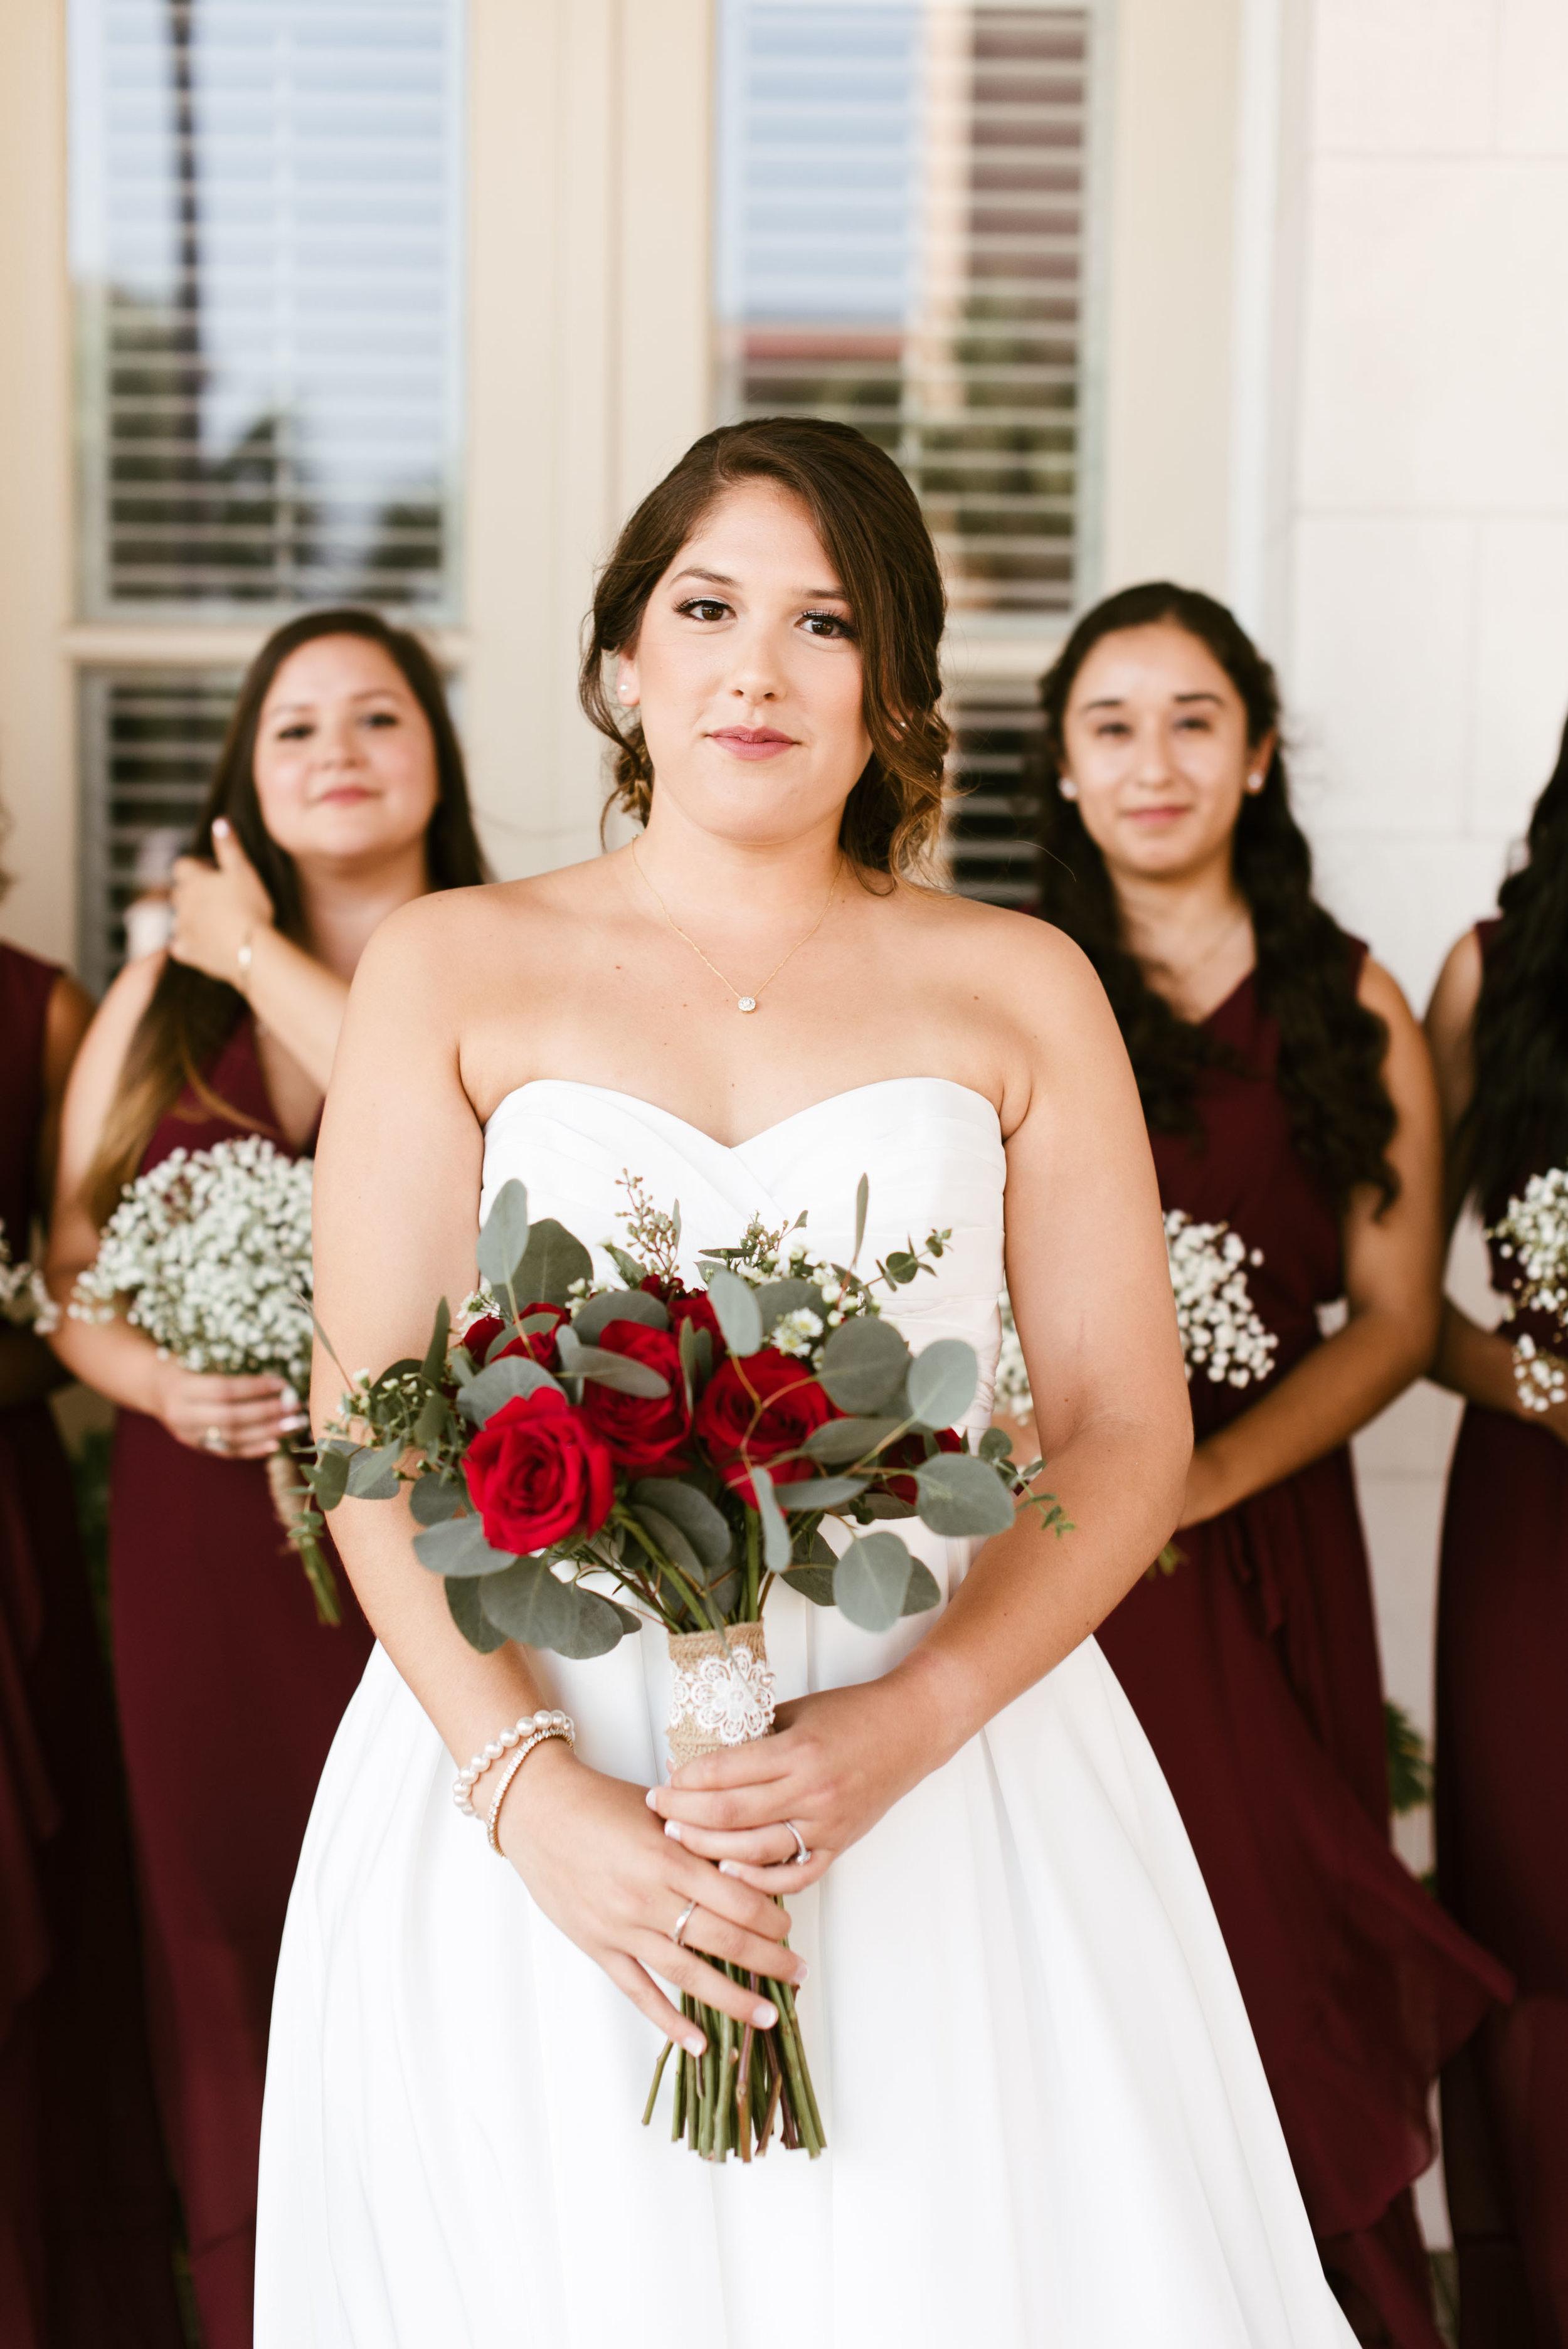 Intimate Downtown Galveston Wedding | Houston Natural Light Wedding Photographer | www.jordanmitchellphotography.com